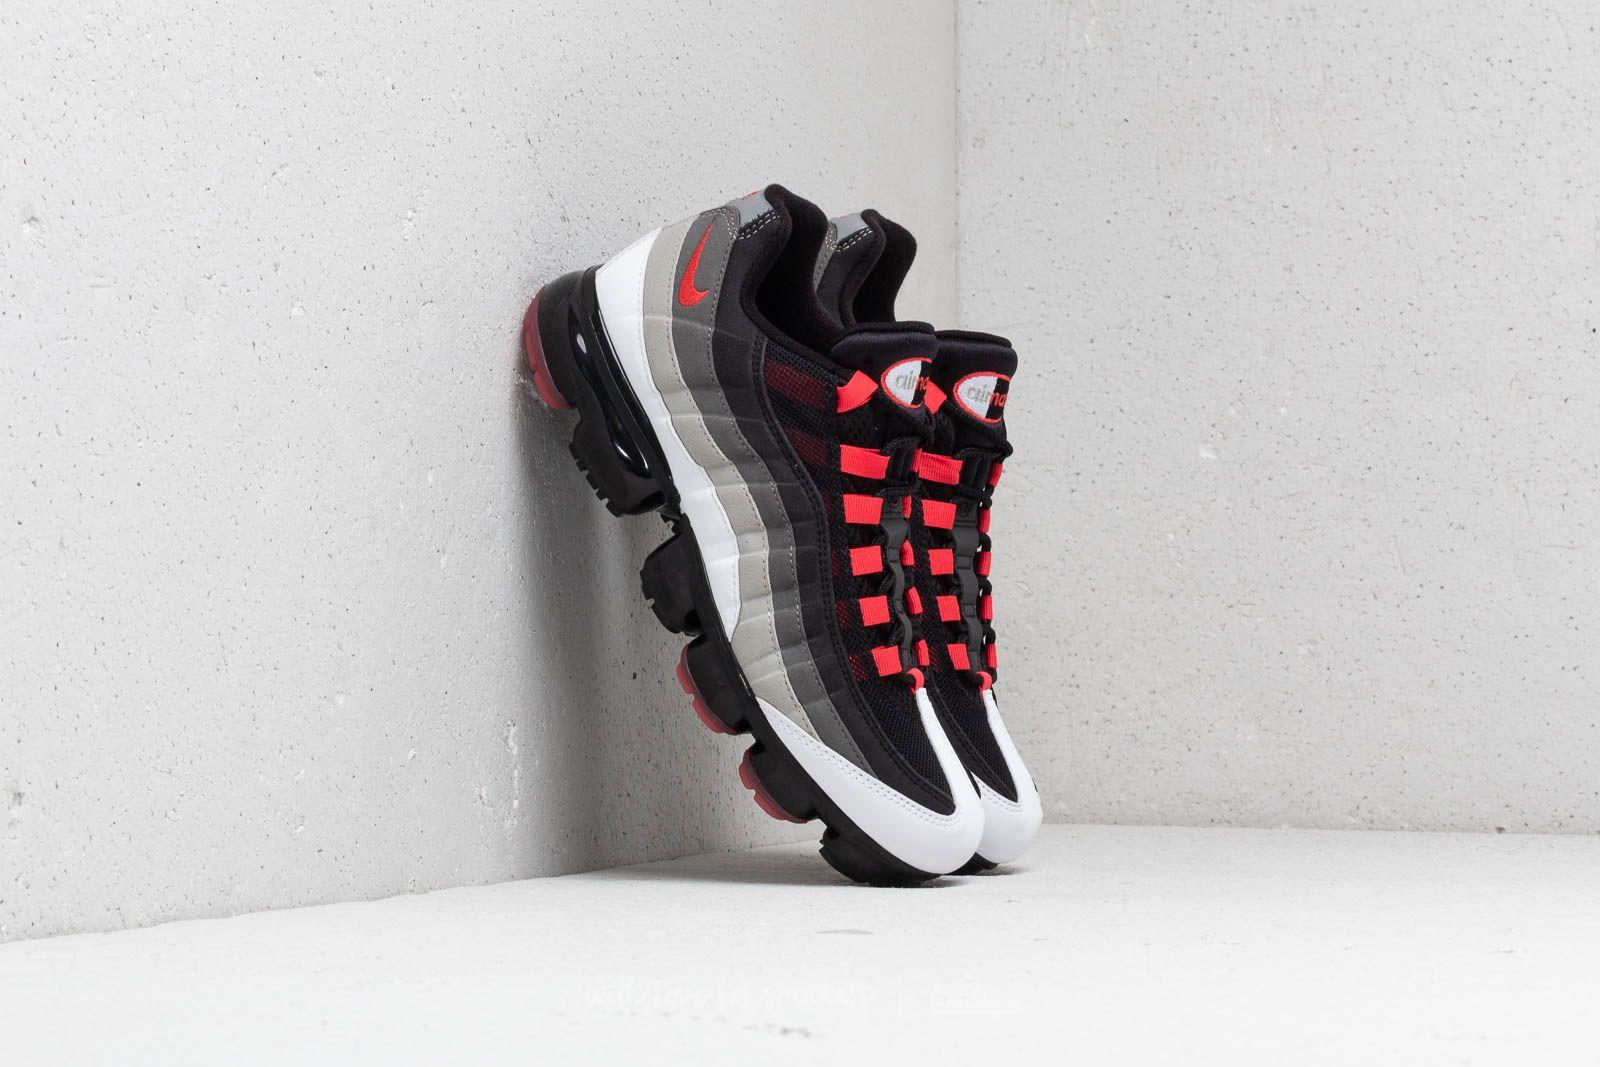 Pánské tenisky a boty Nike Air Vapormax '95 White/ Hot Red-Dark Pewter